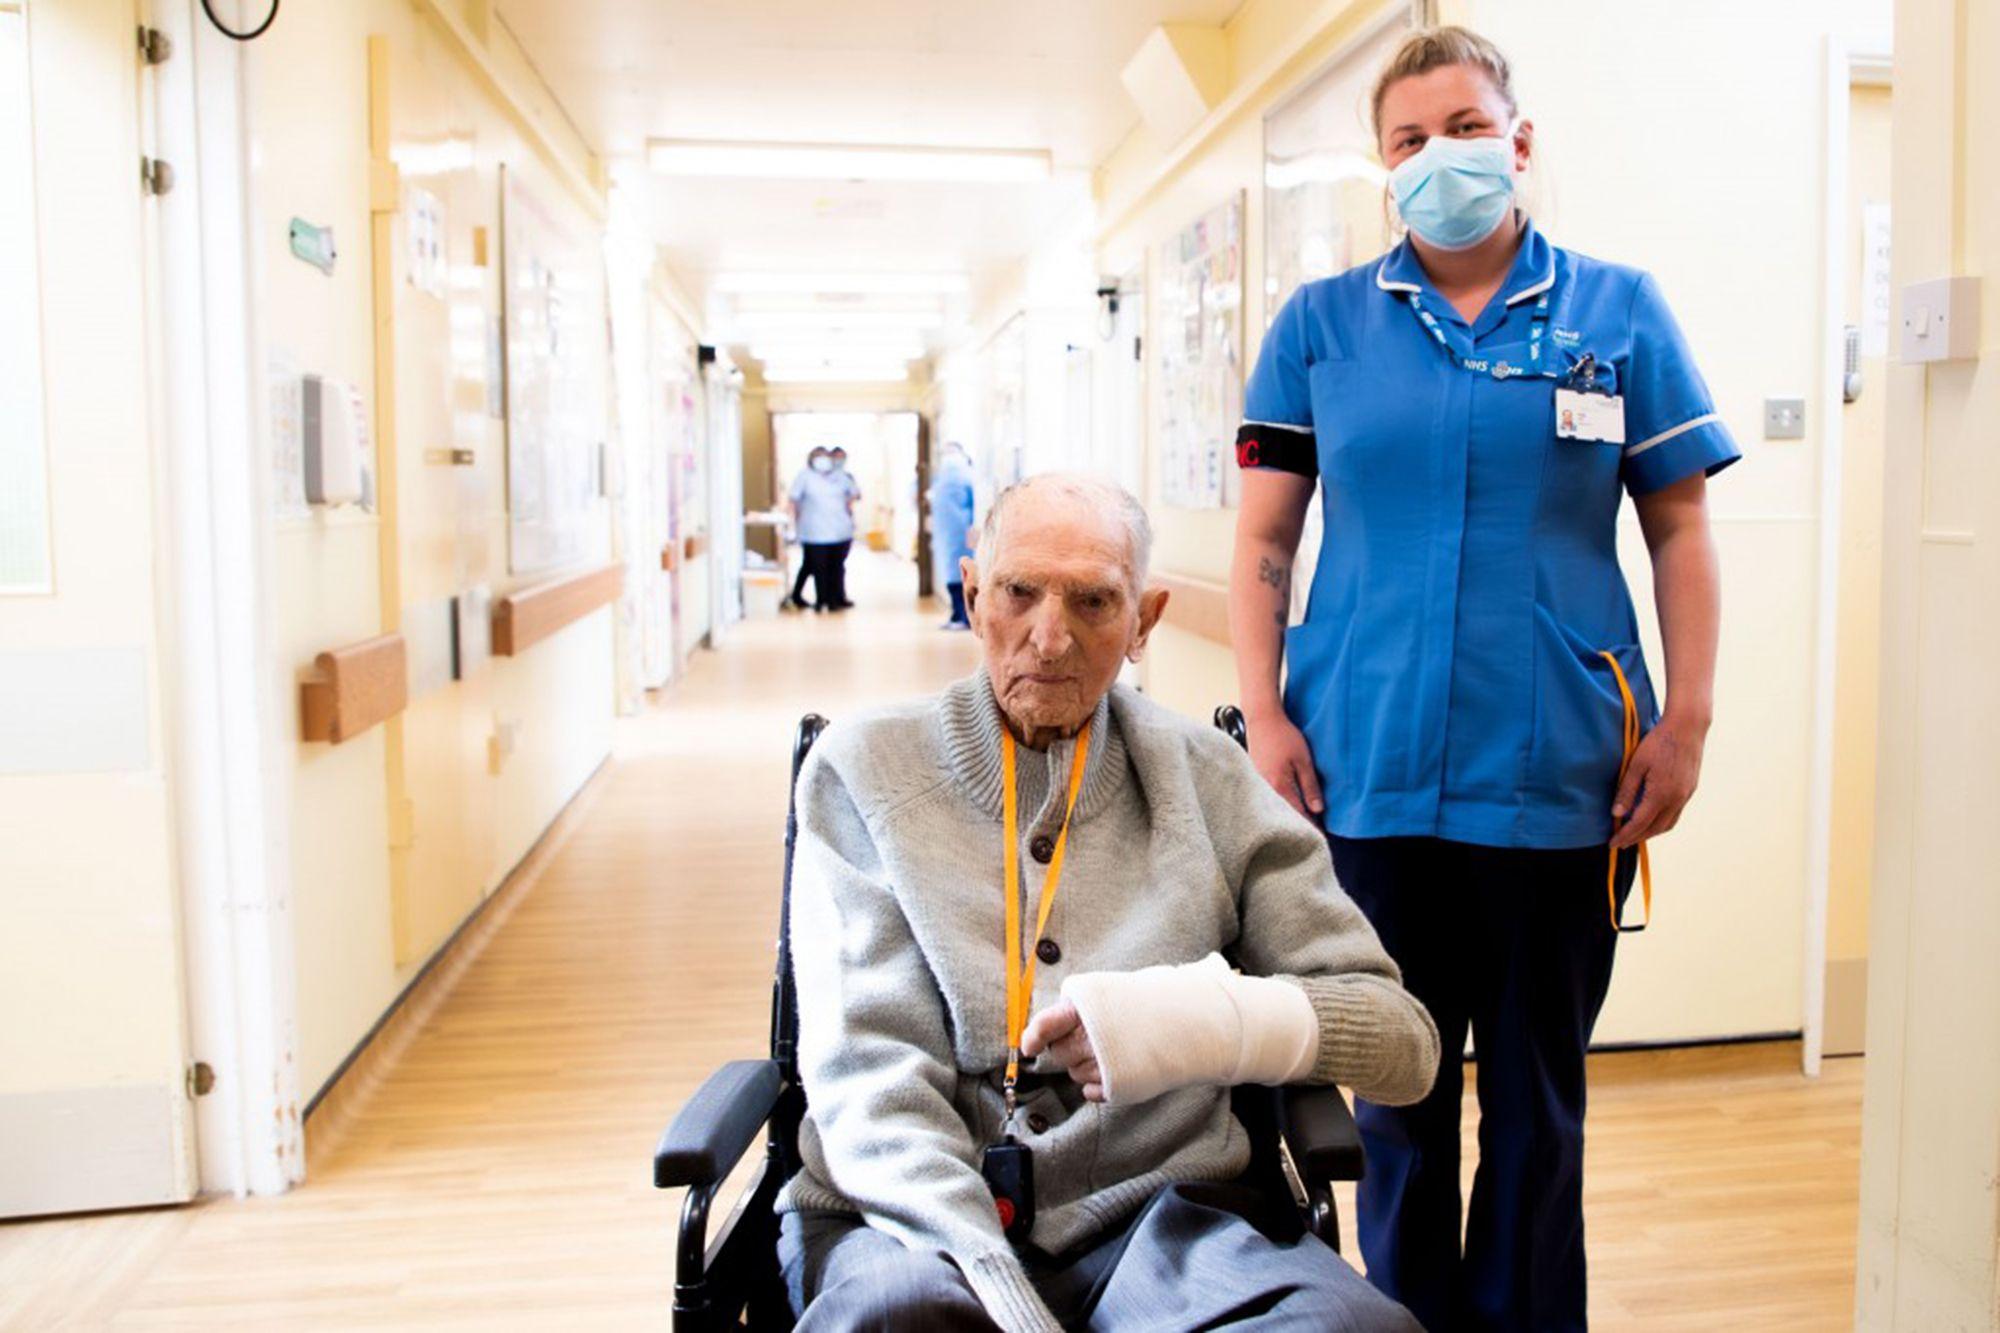 99-year-old WWII vet albert chambers applause after beating coronavirus